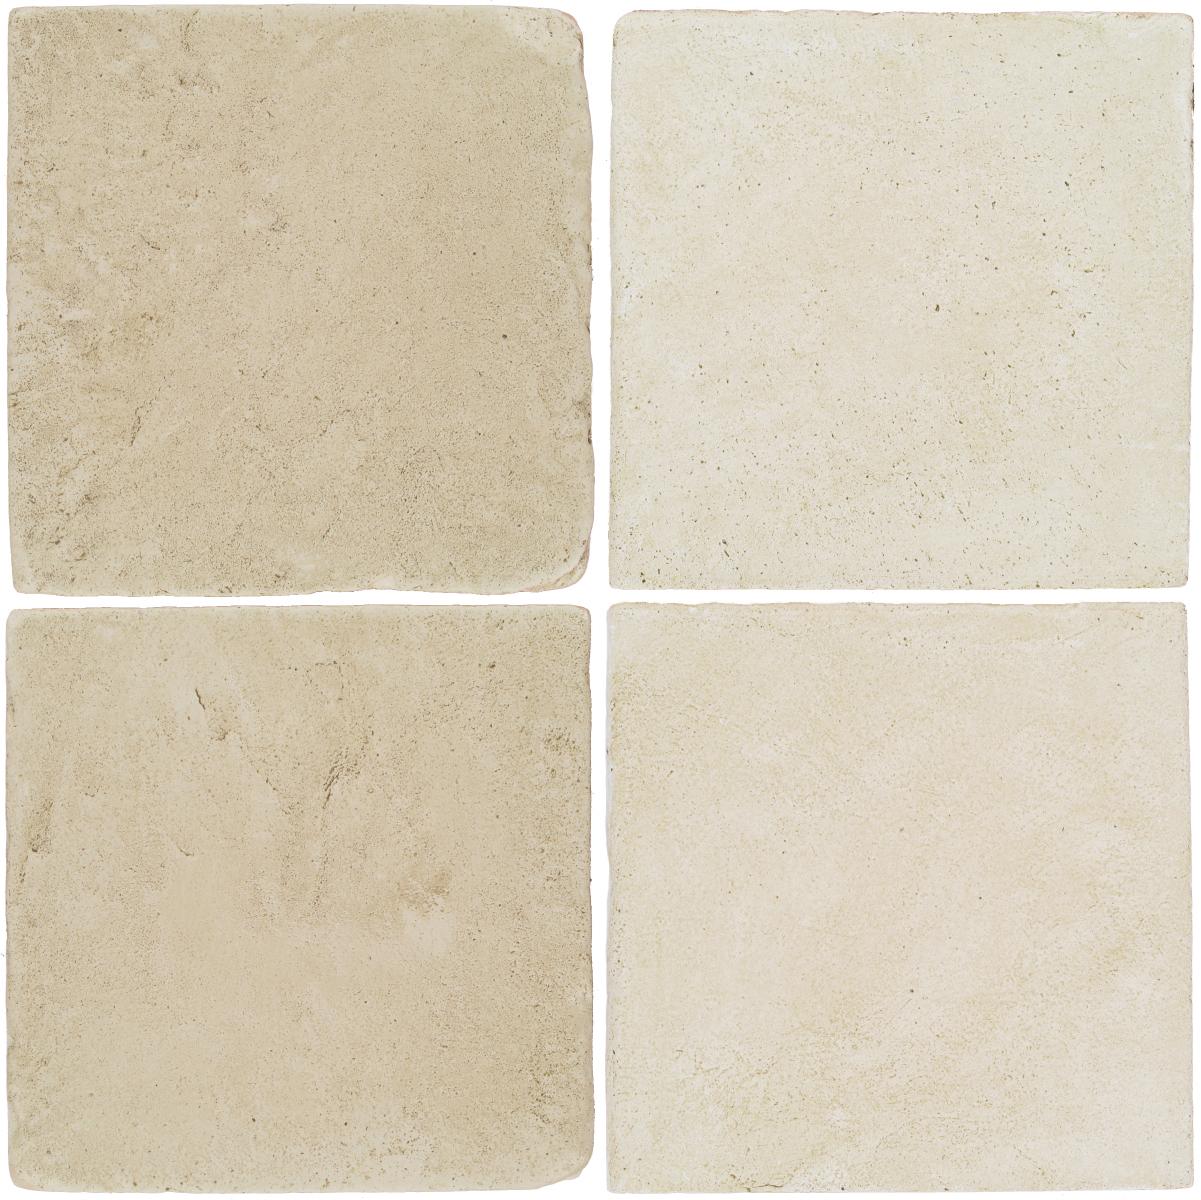 Pedralbes Antique Terracotta  2 Color Combinations  VTG-PGLW Glacier White + OHS-PGAW Antique White